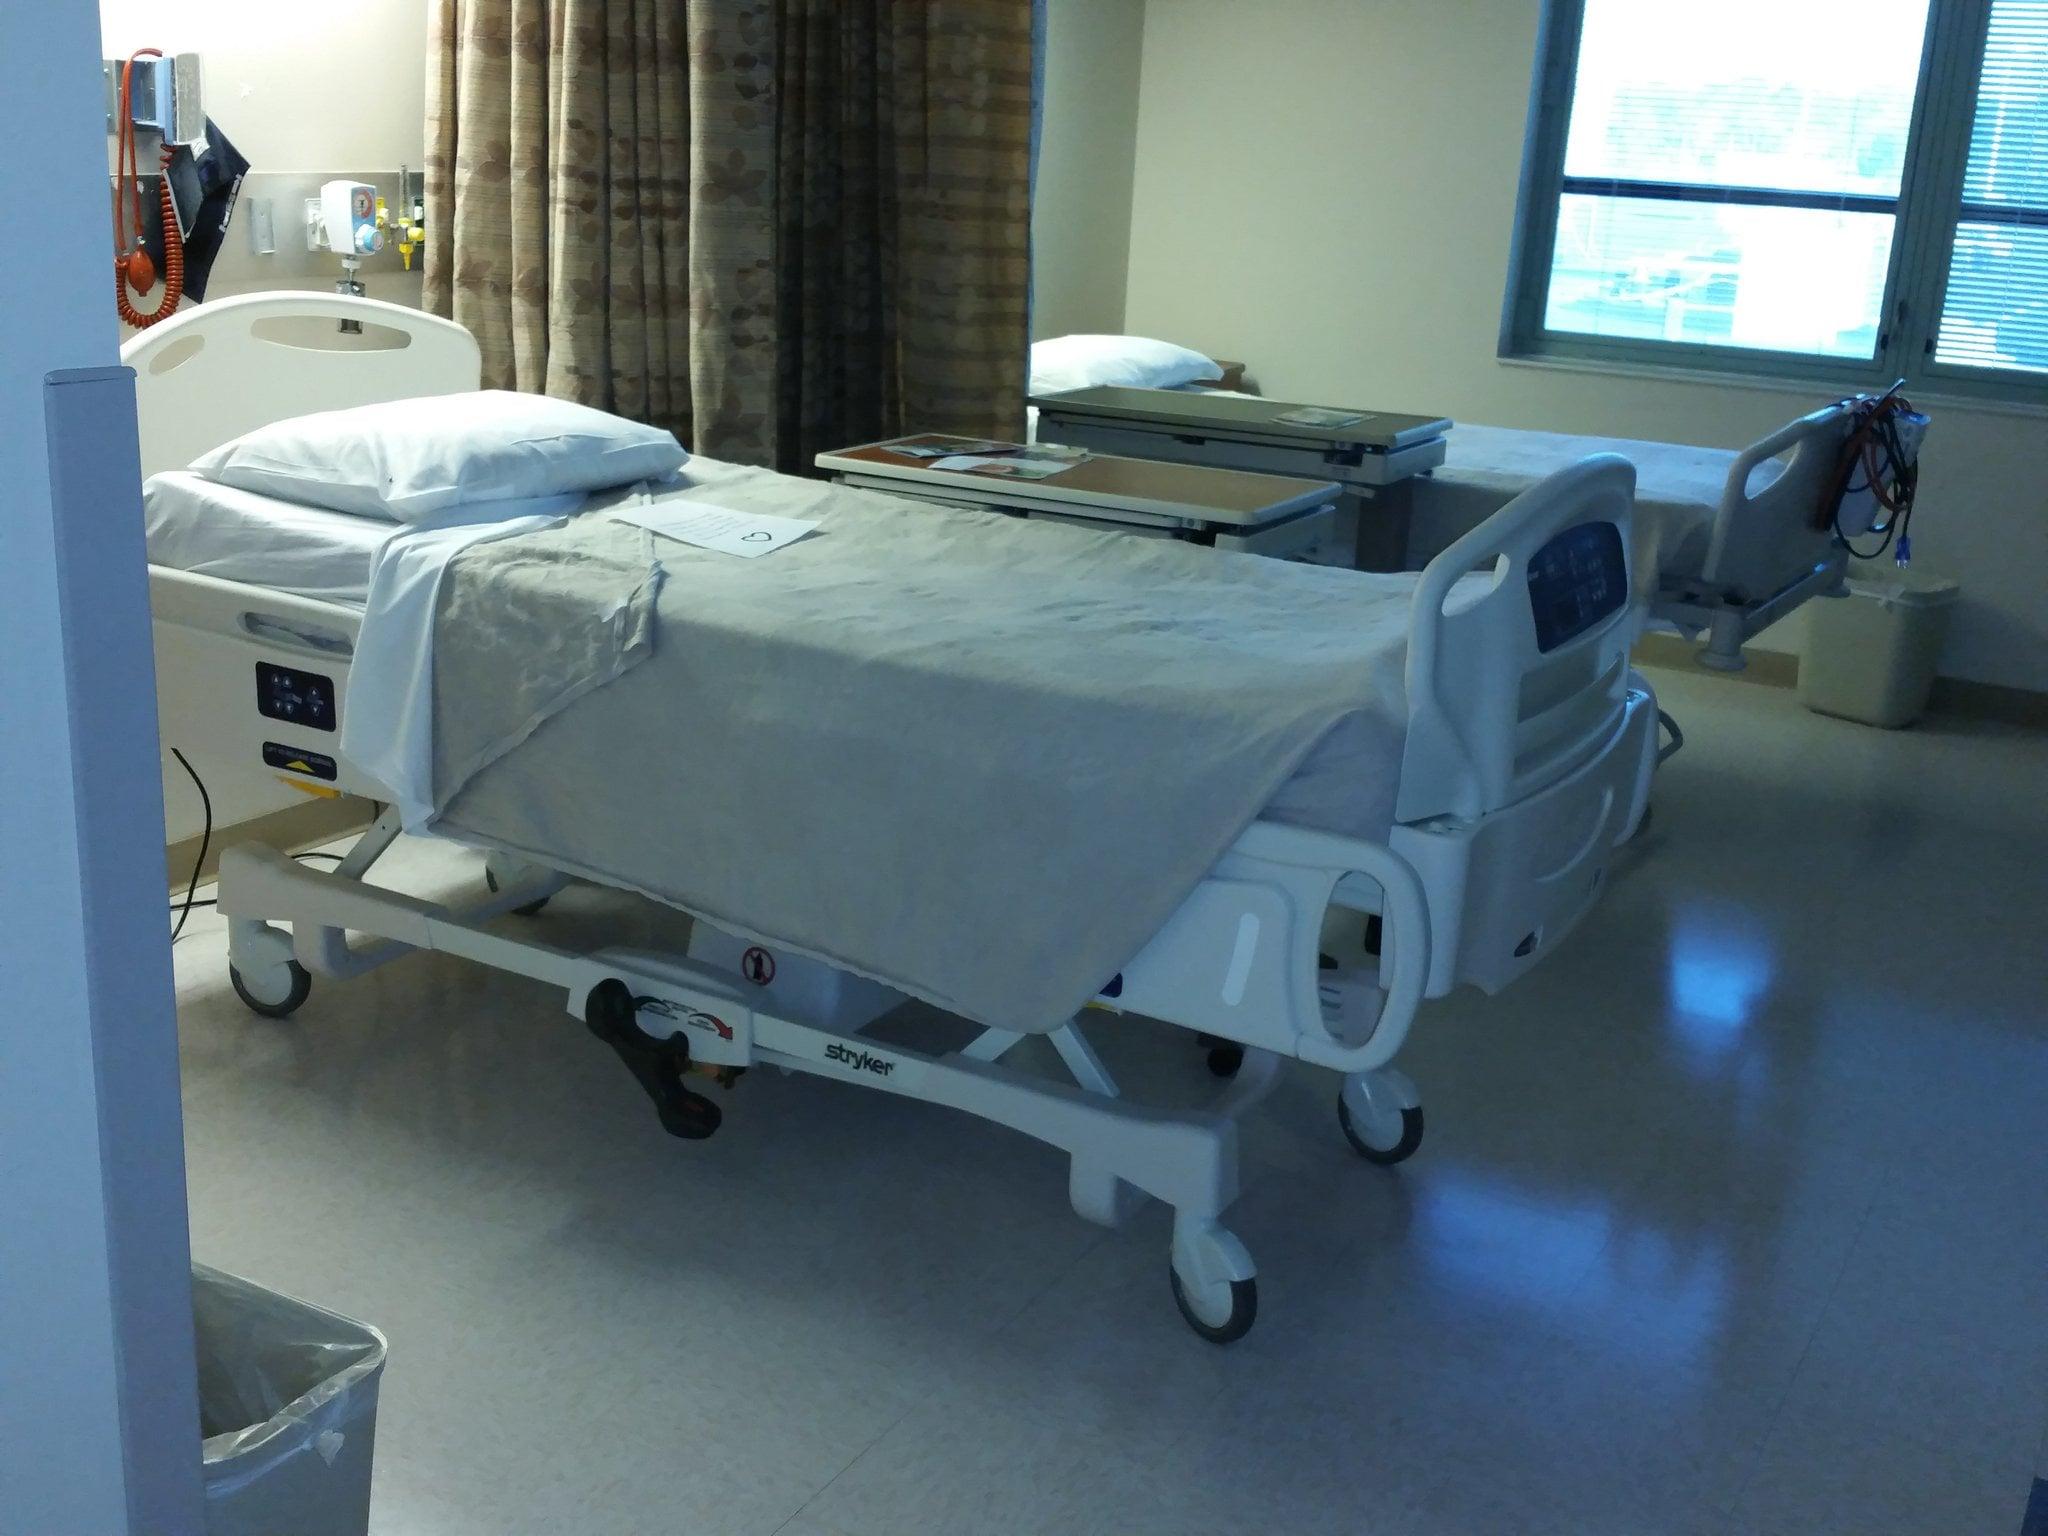 BRMC hospital - inside photo